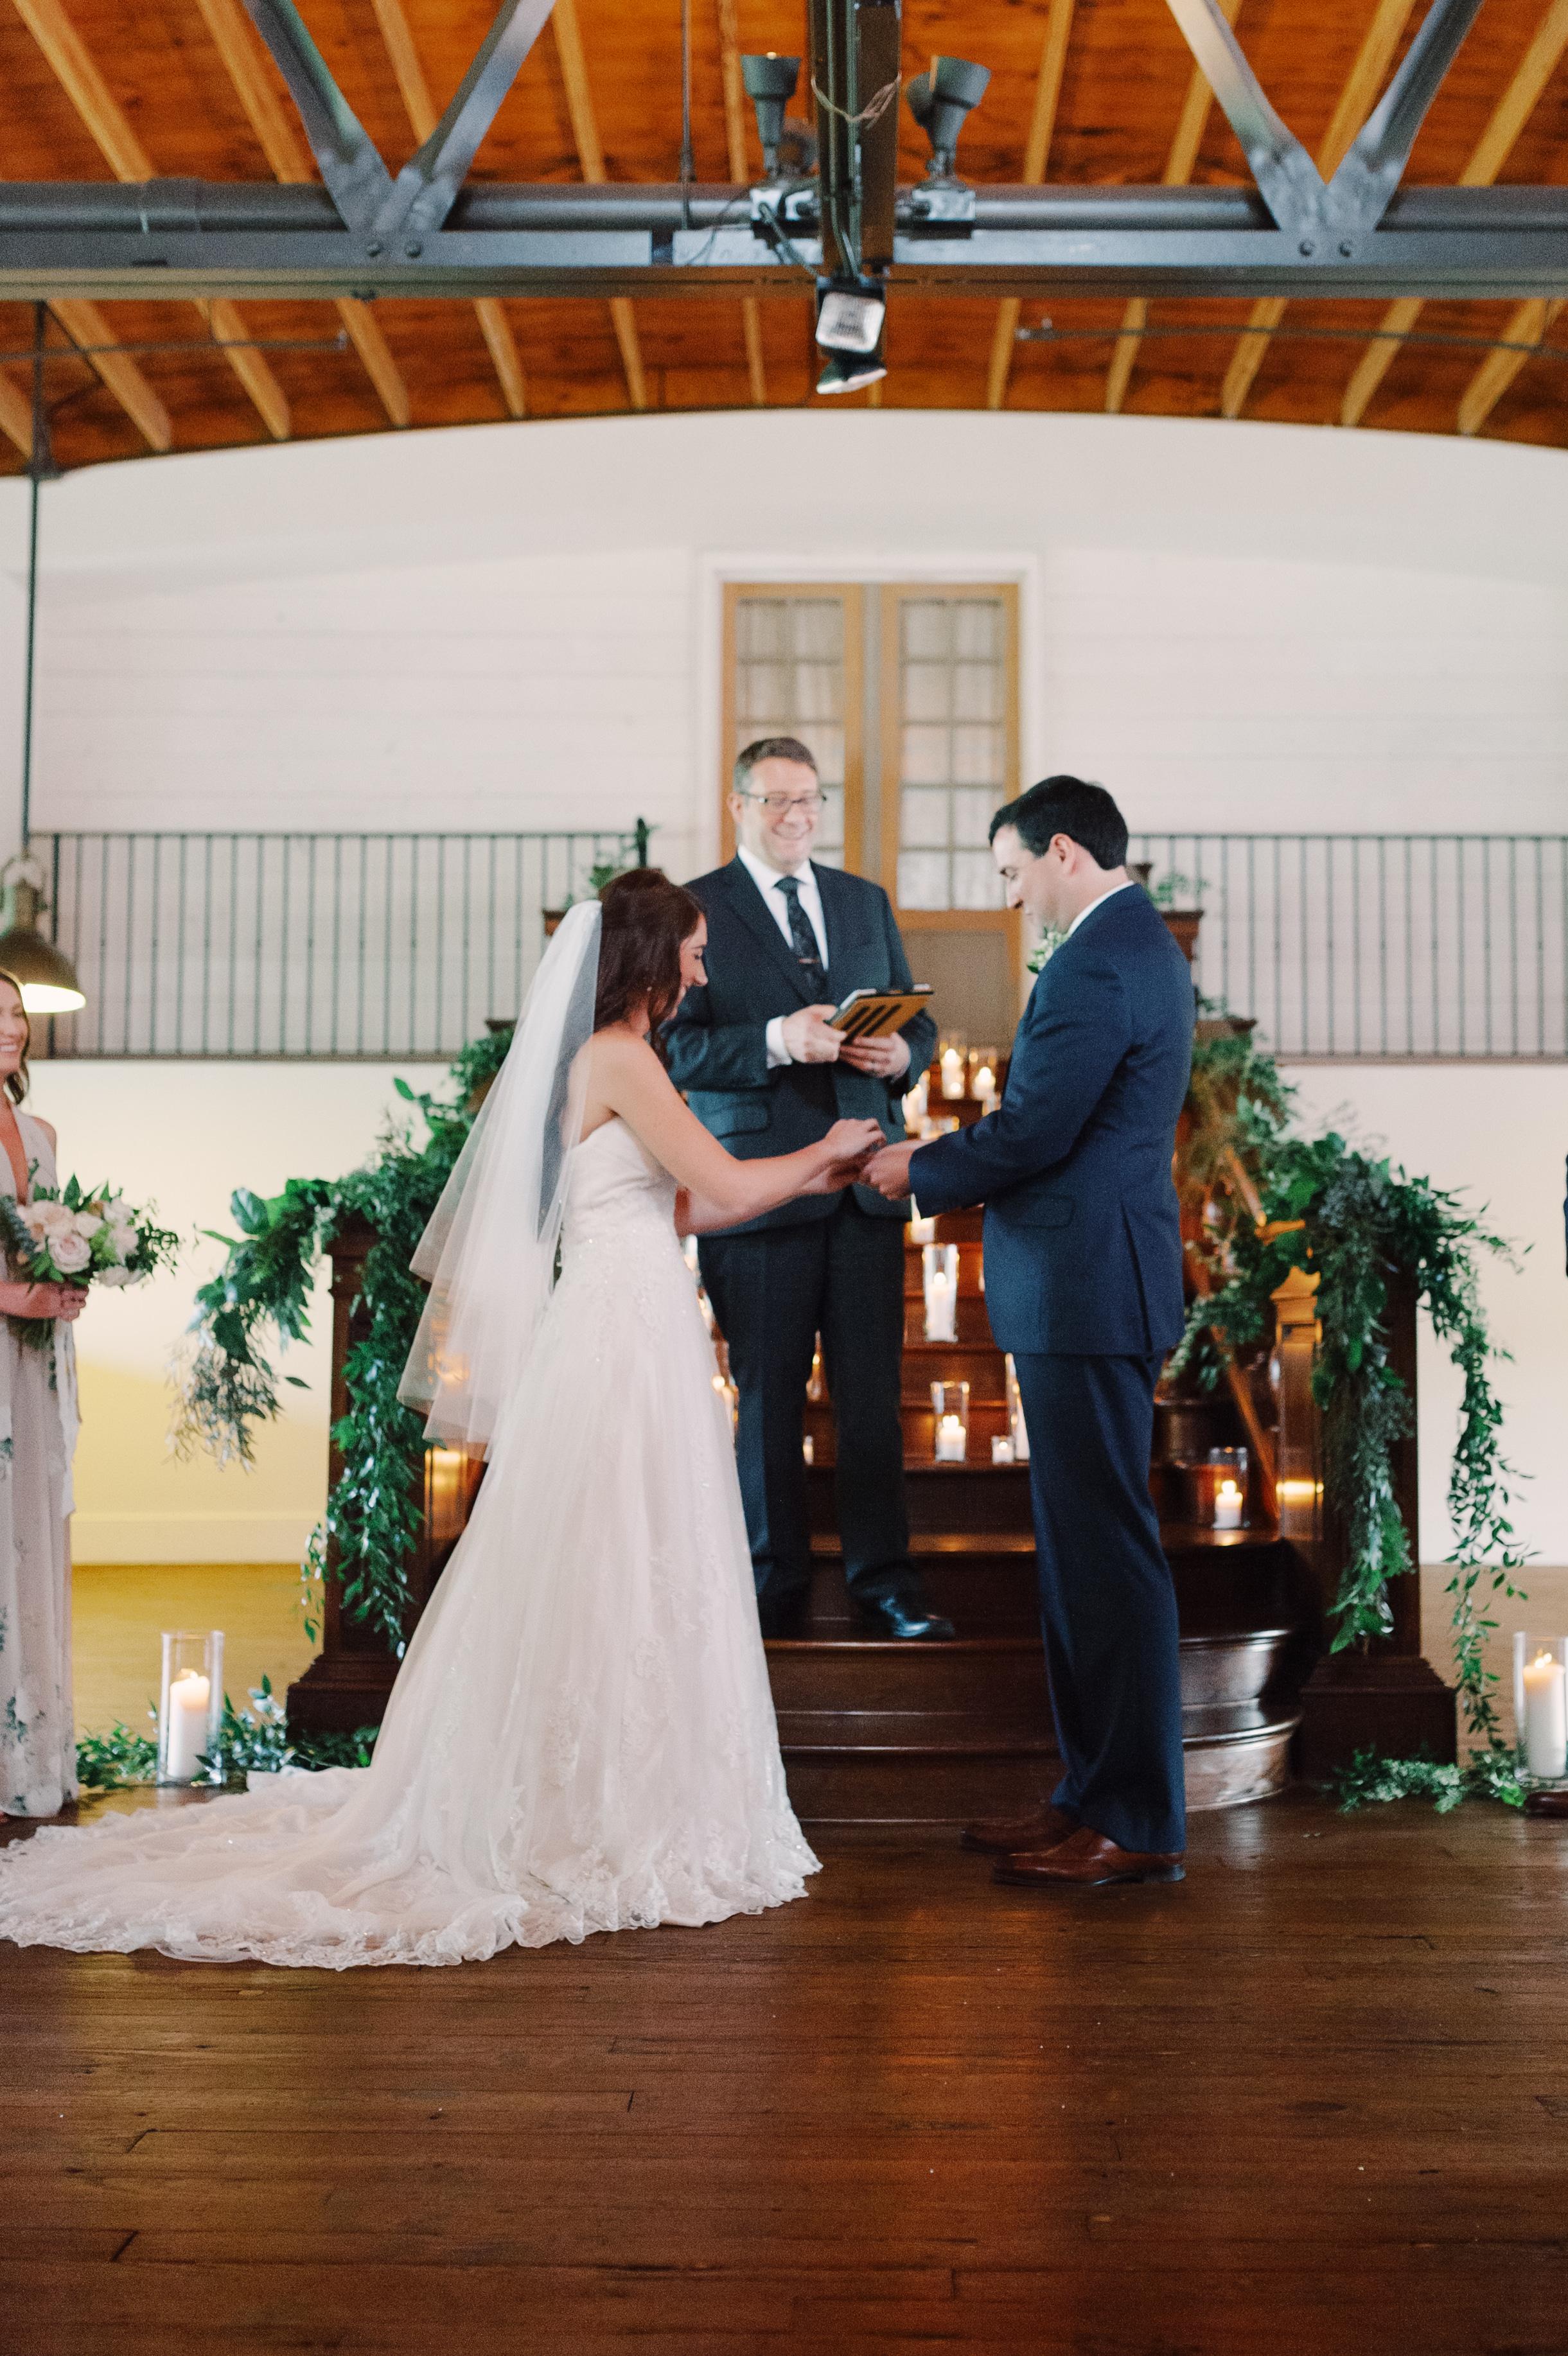 Romantic-Summerour-studio-wedding-hannah-forsberg-atlanta-wedding-photographer49.JPG